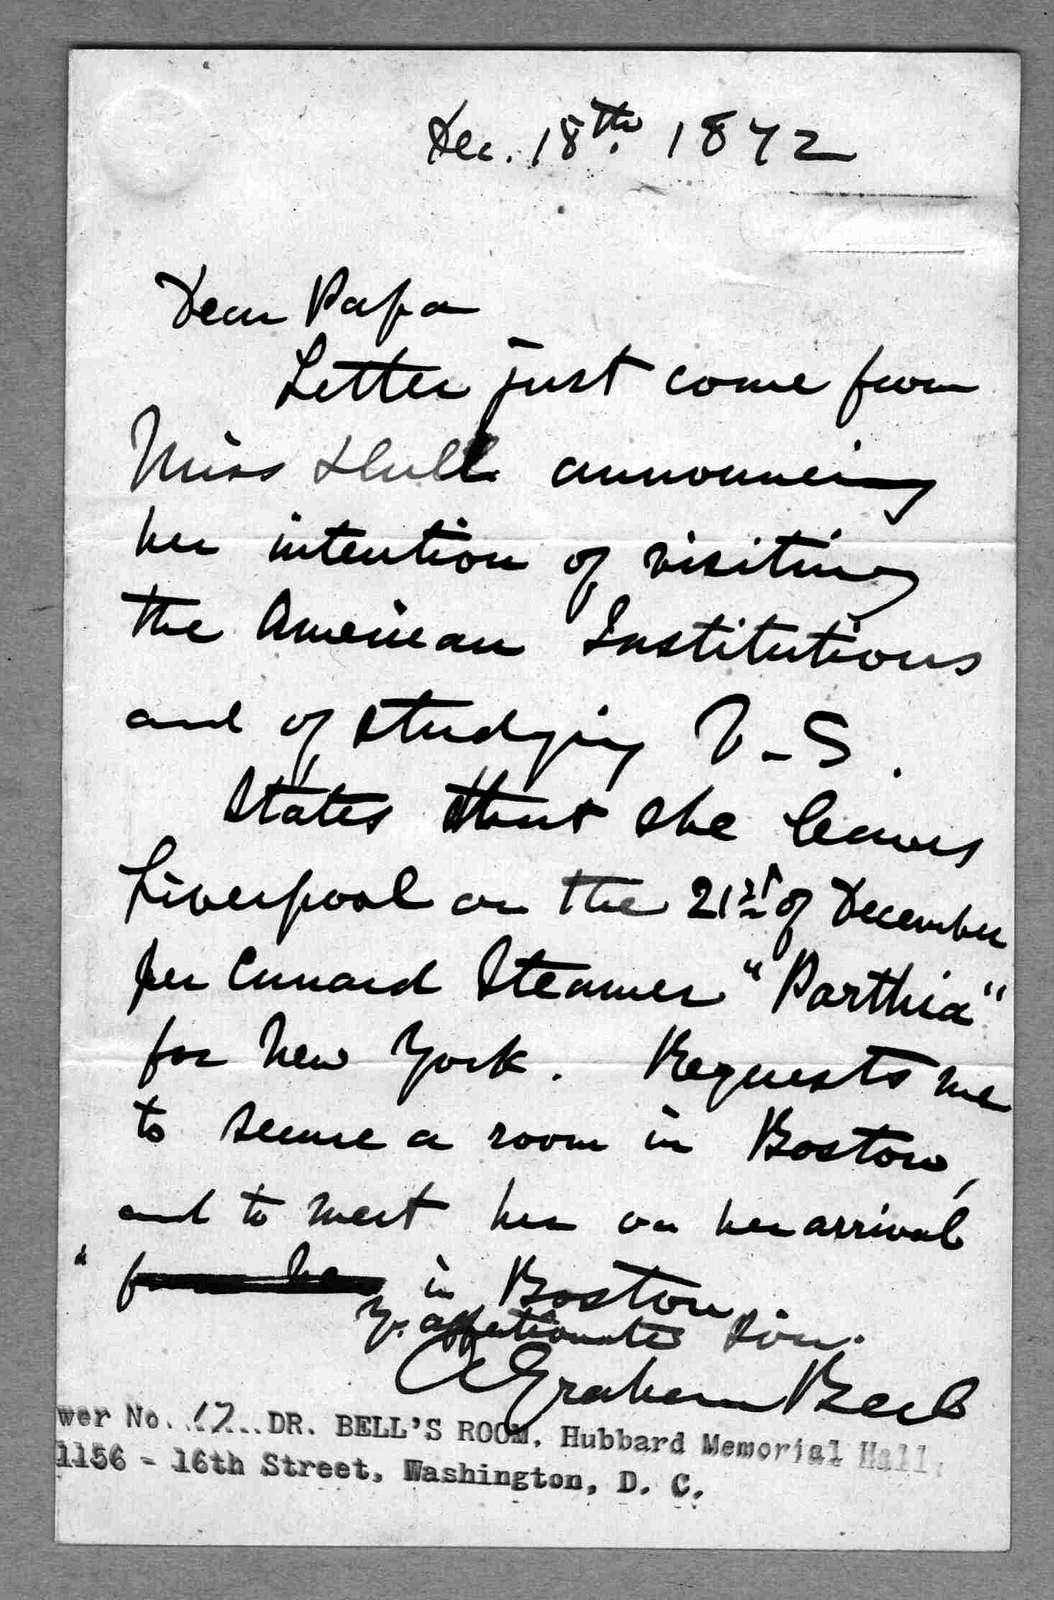 Letter from Alexander Graham Bell to Alexander Melville Bell, December 18, 1872